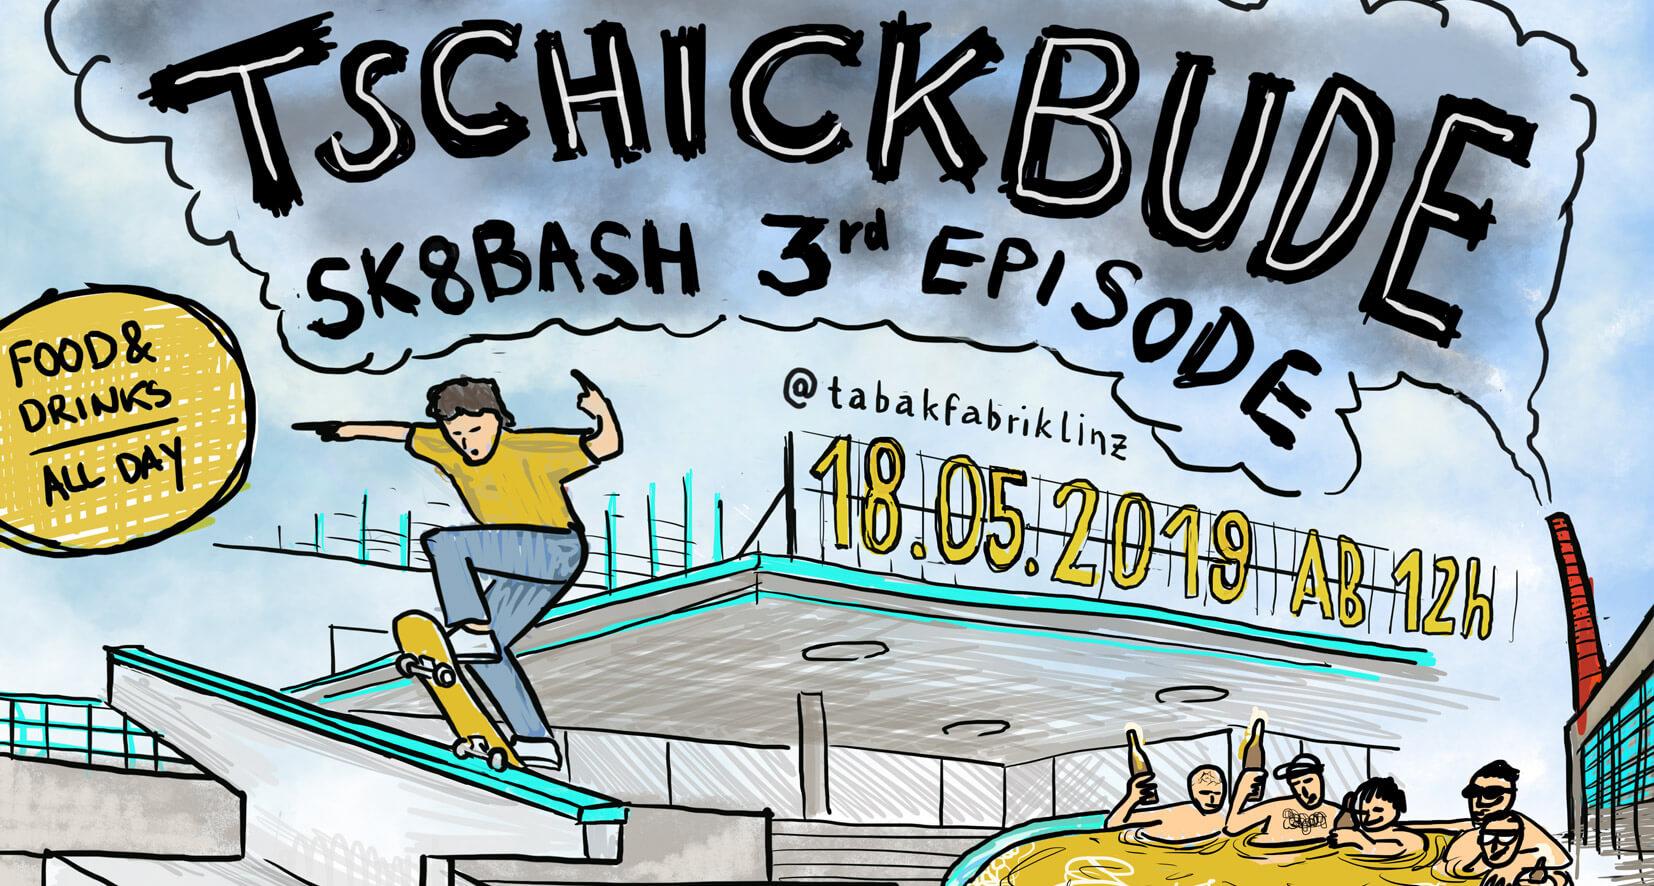 2019_tschickbude_skatebash_facebook_veranstaltung